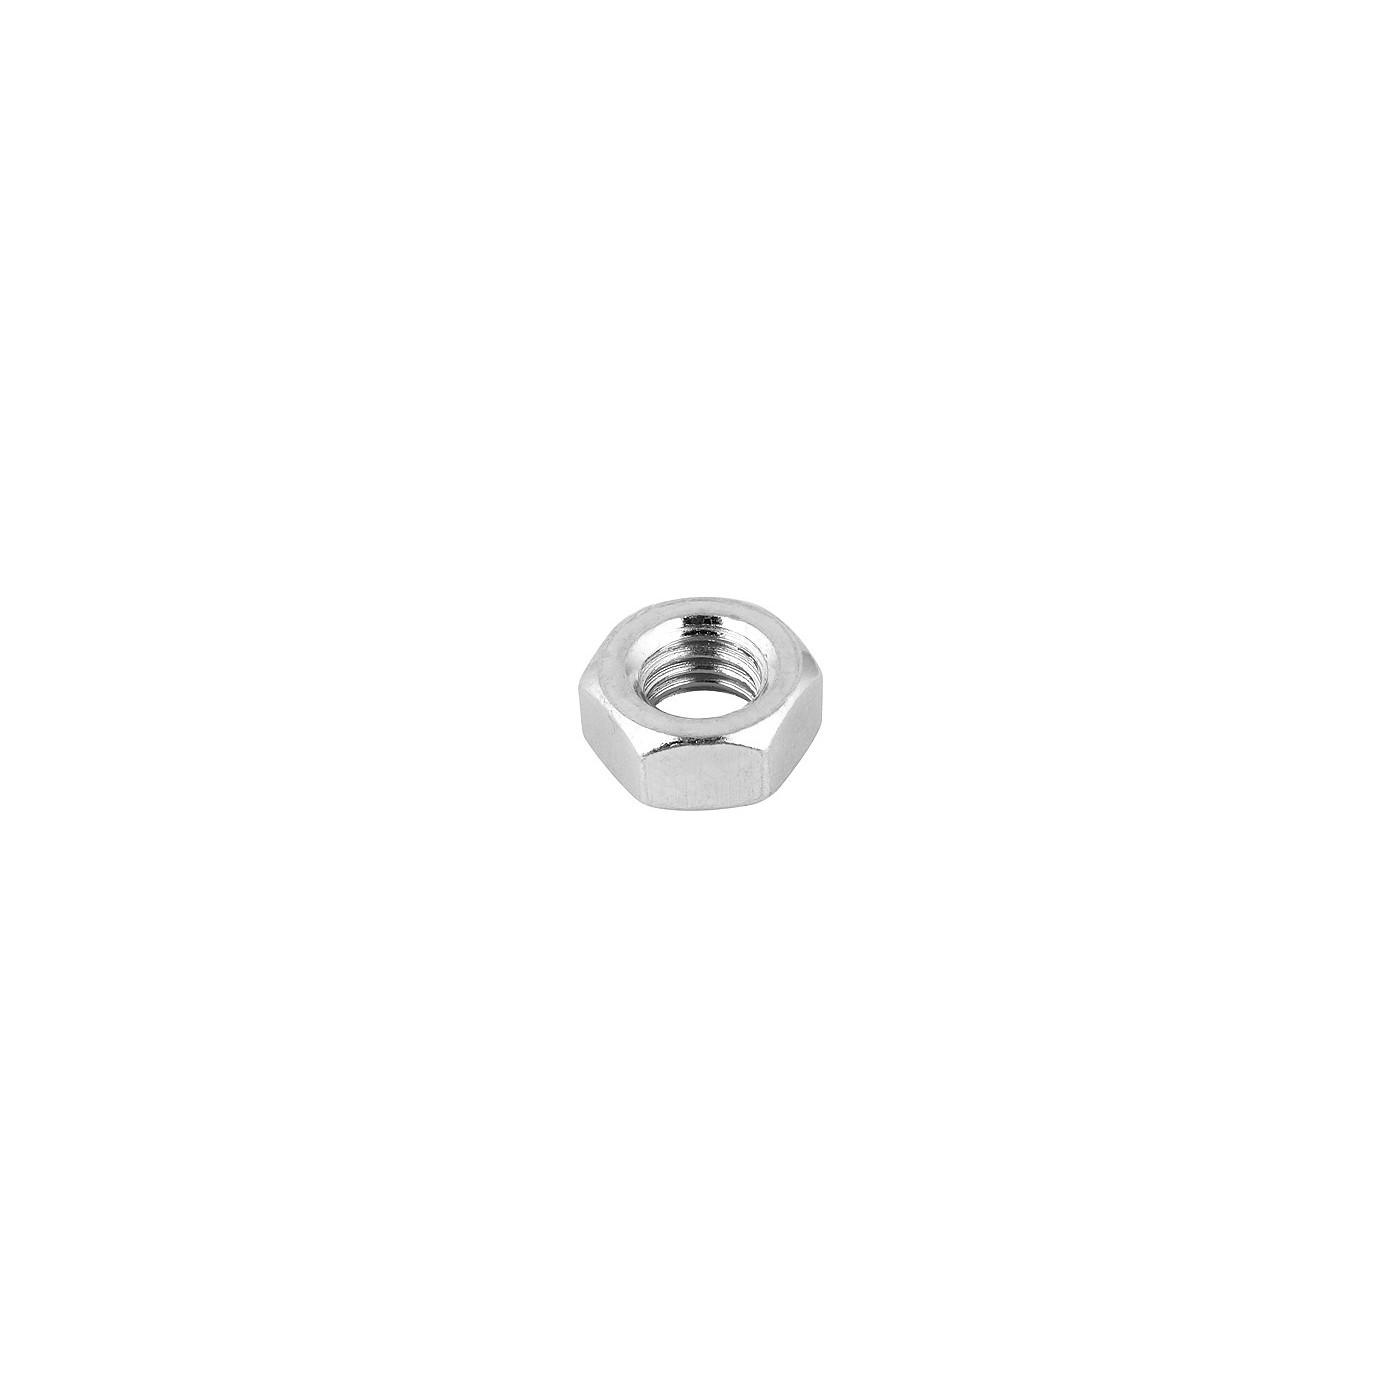 Set of 40 hexagon nuts (M3, galvanized steel, DIN 934)  - 1